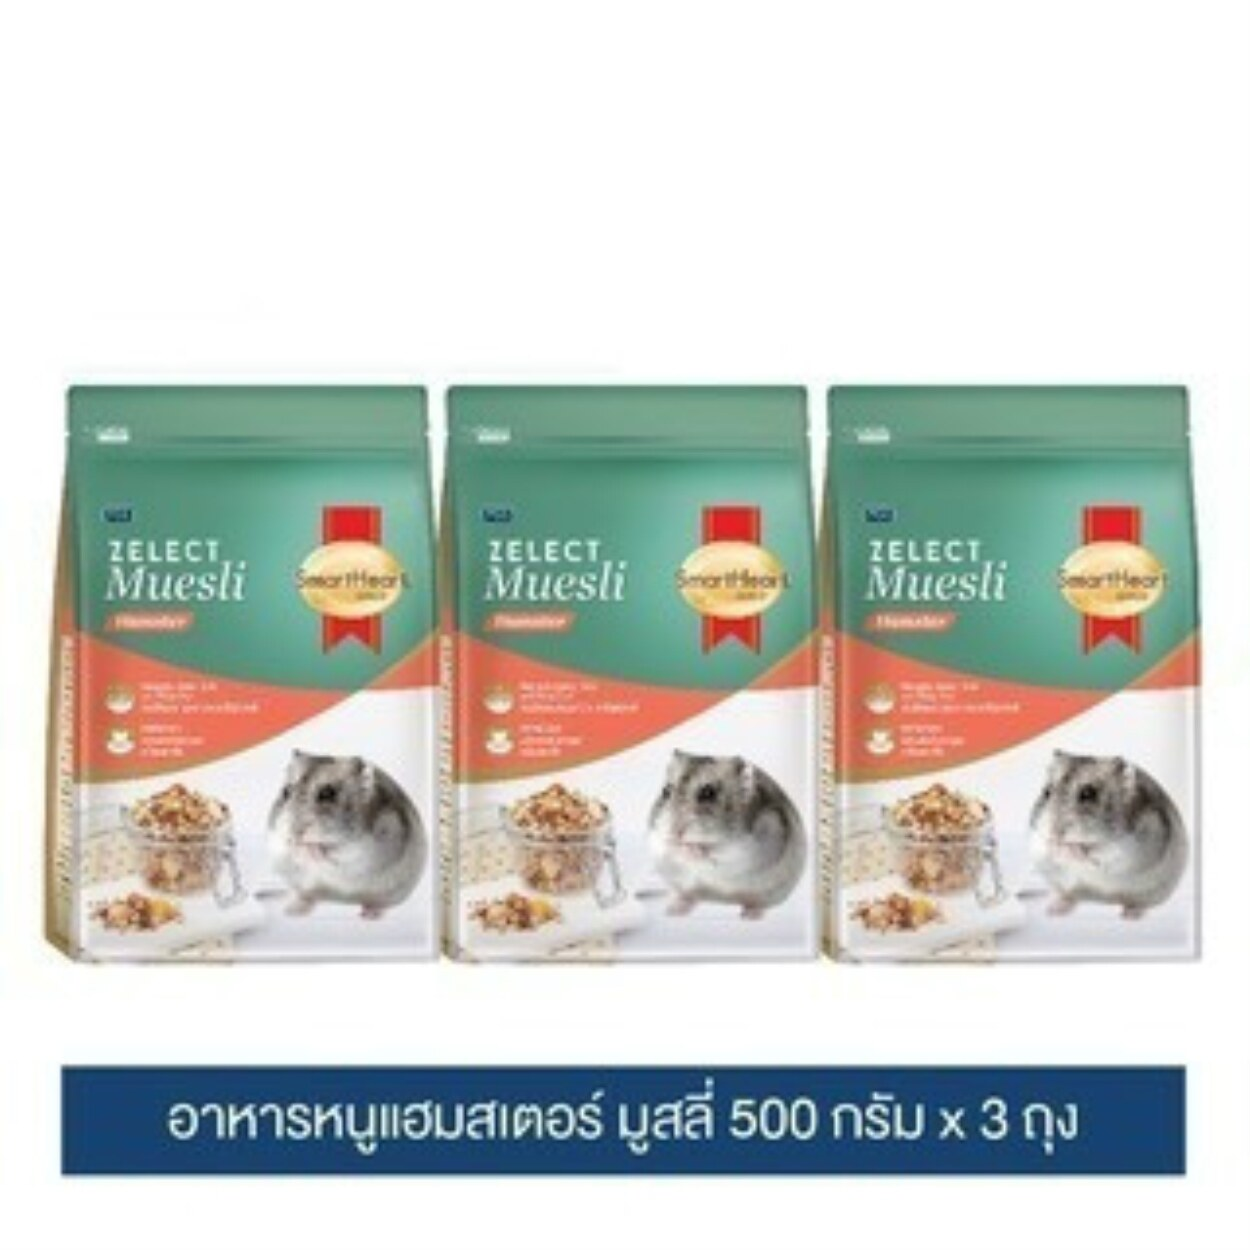 vitakraft สมาร์ทฮาร์ท โกลด์ ซีเลกต์ มูสลี่ อาหารหนูแฮมสเตอร์  500 กรัม x 3 ถุง / SmartHeart Gold Zelect Muesli Hamster 500 G